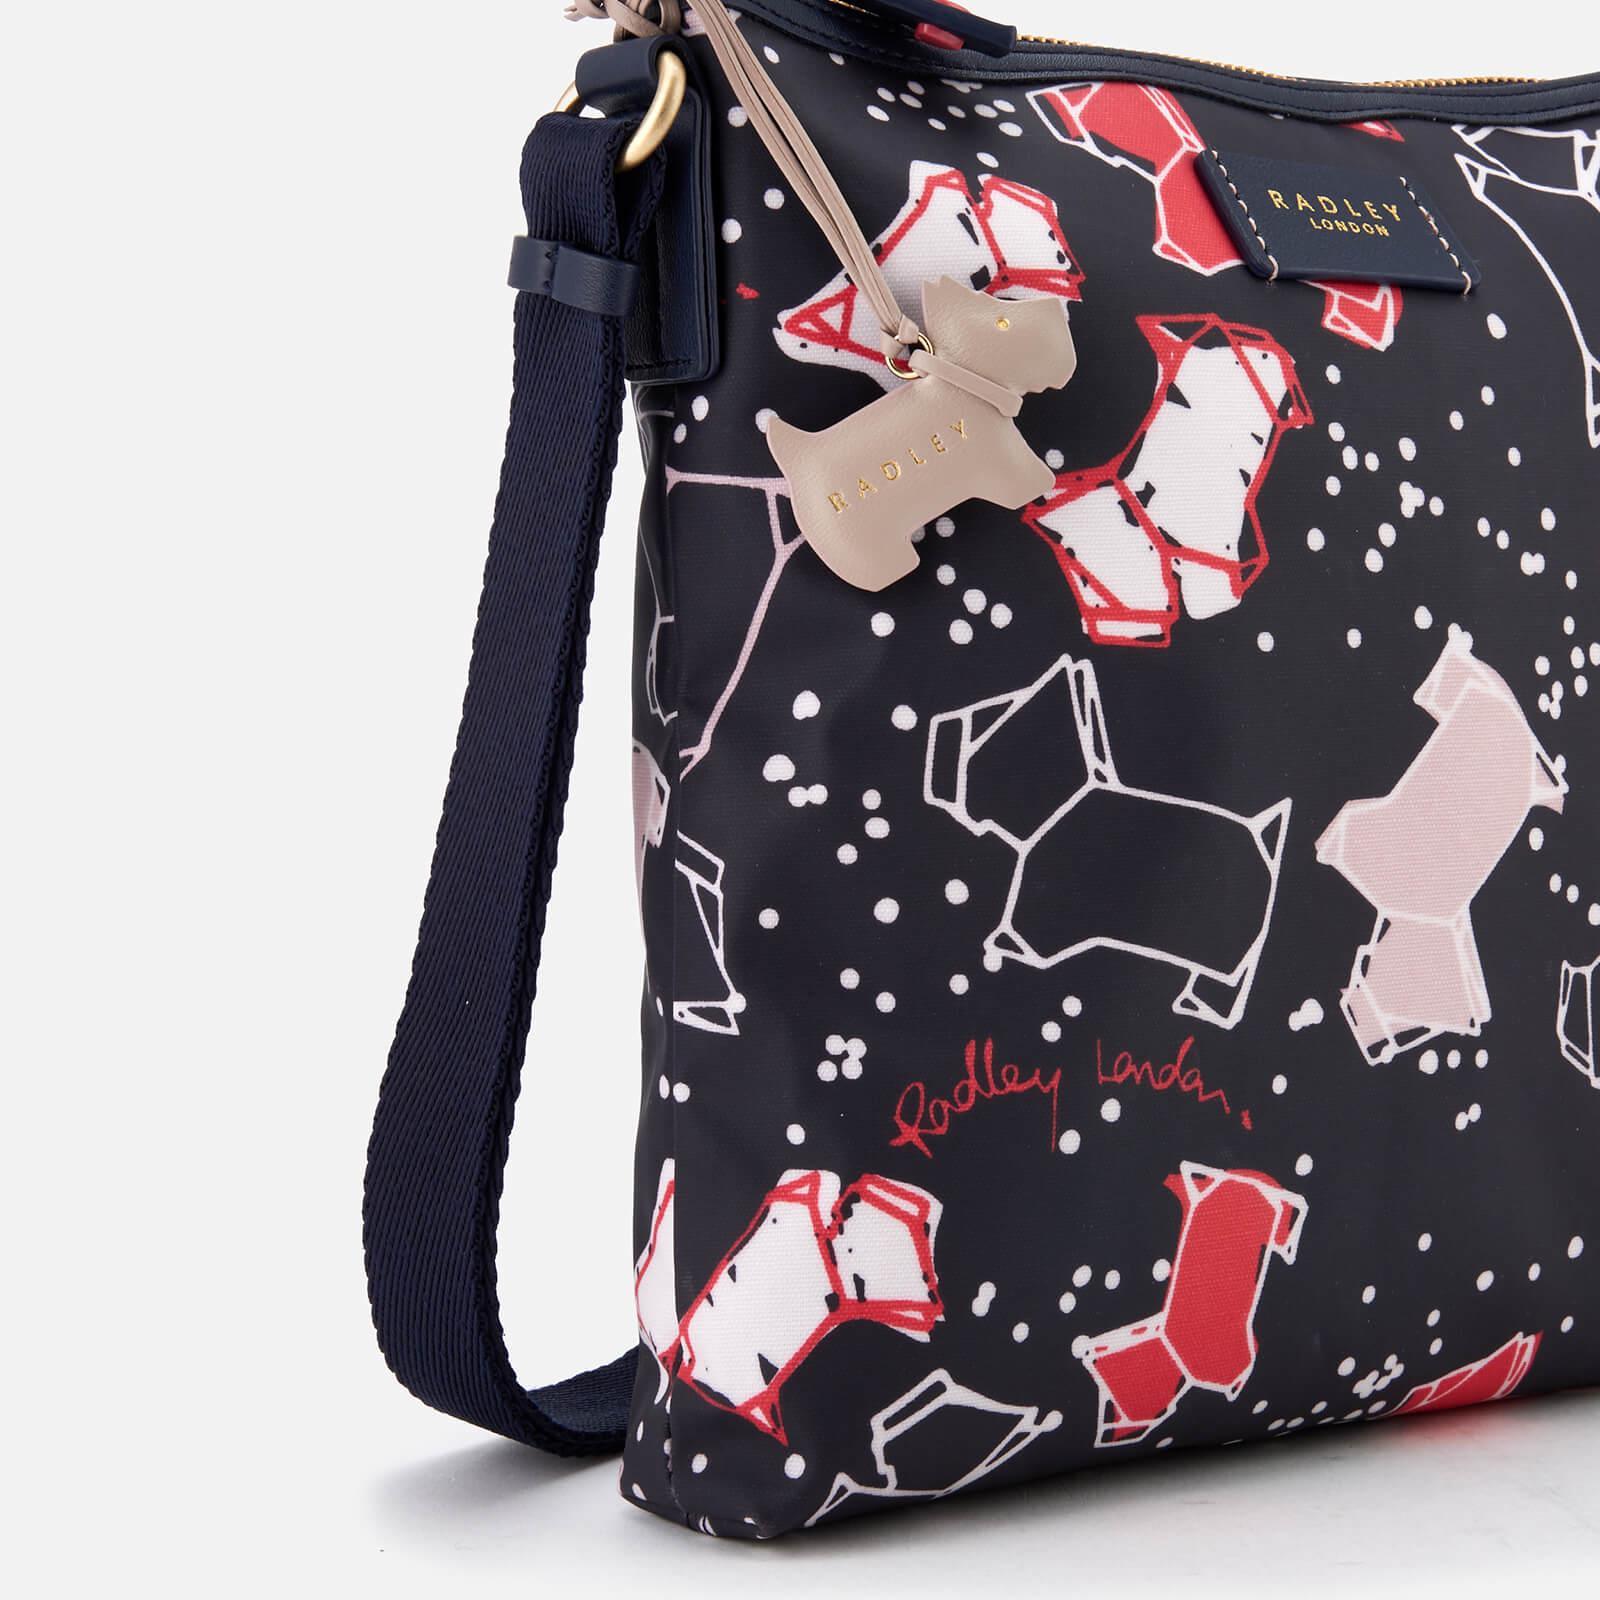 Radley Cotton Speckle Dog Medium Zip-top Cross Body Bag in Blue